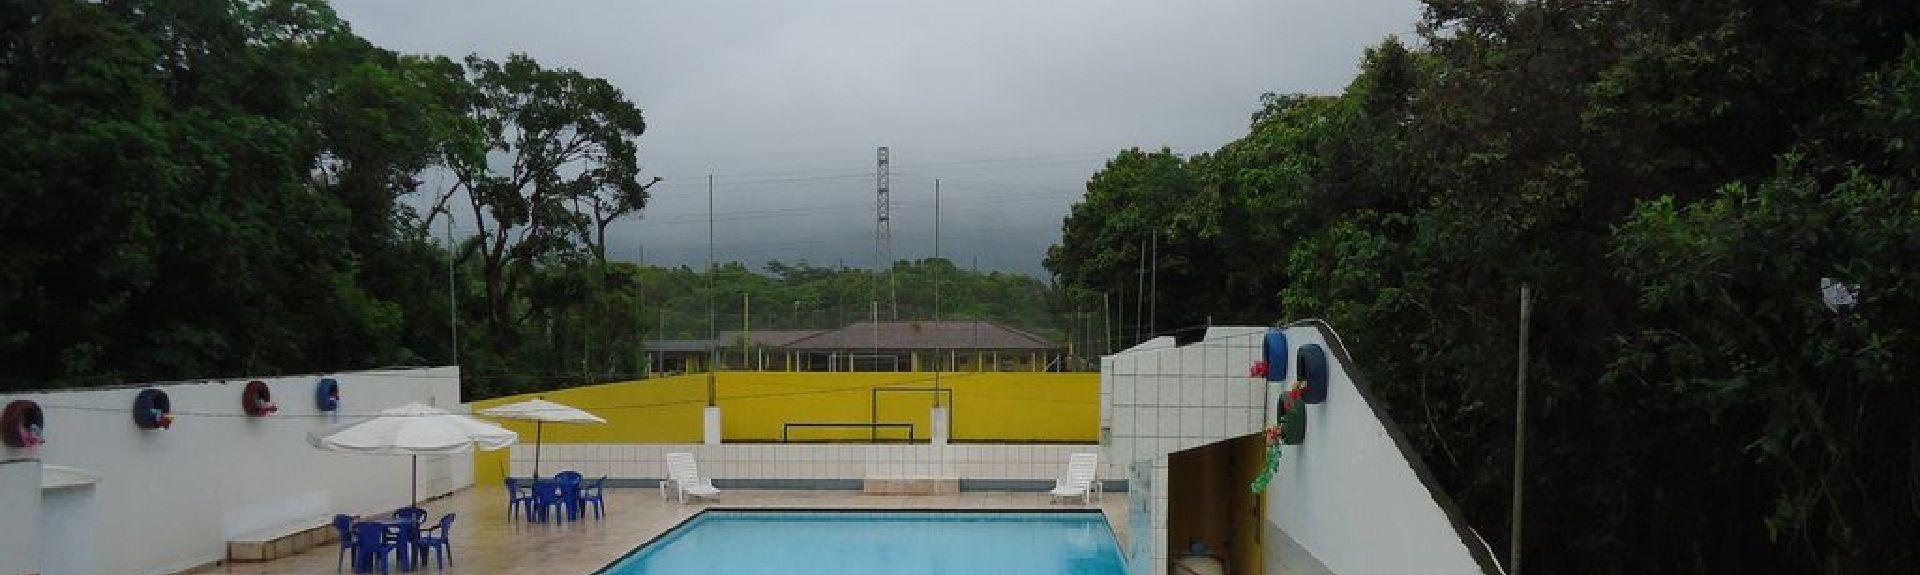 Litoral Sul de São Paulo, São Paulo, Brazilië